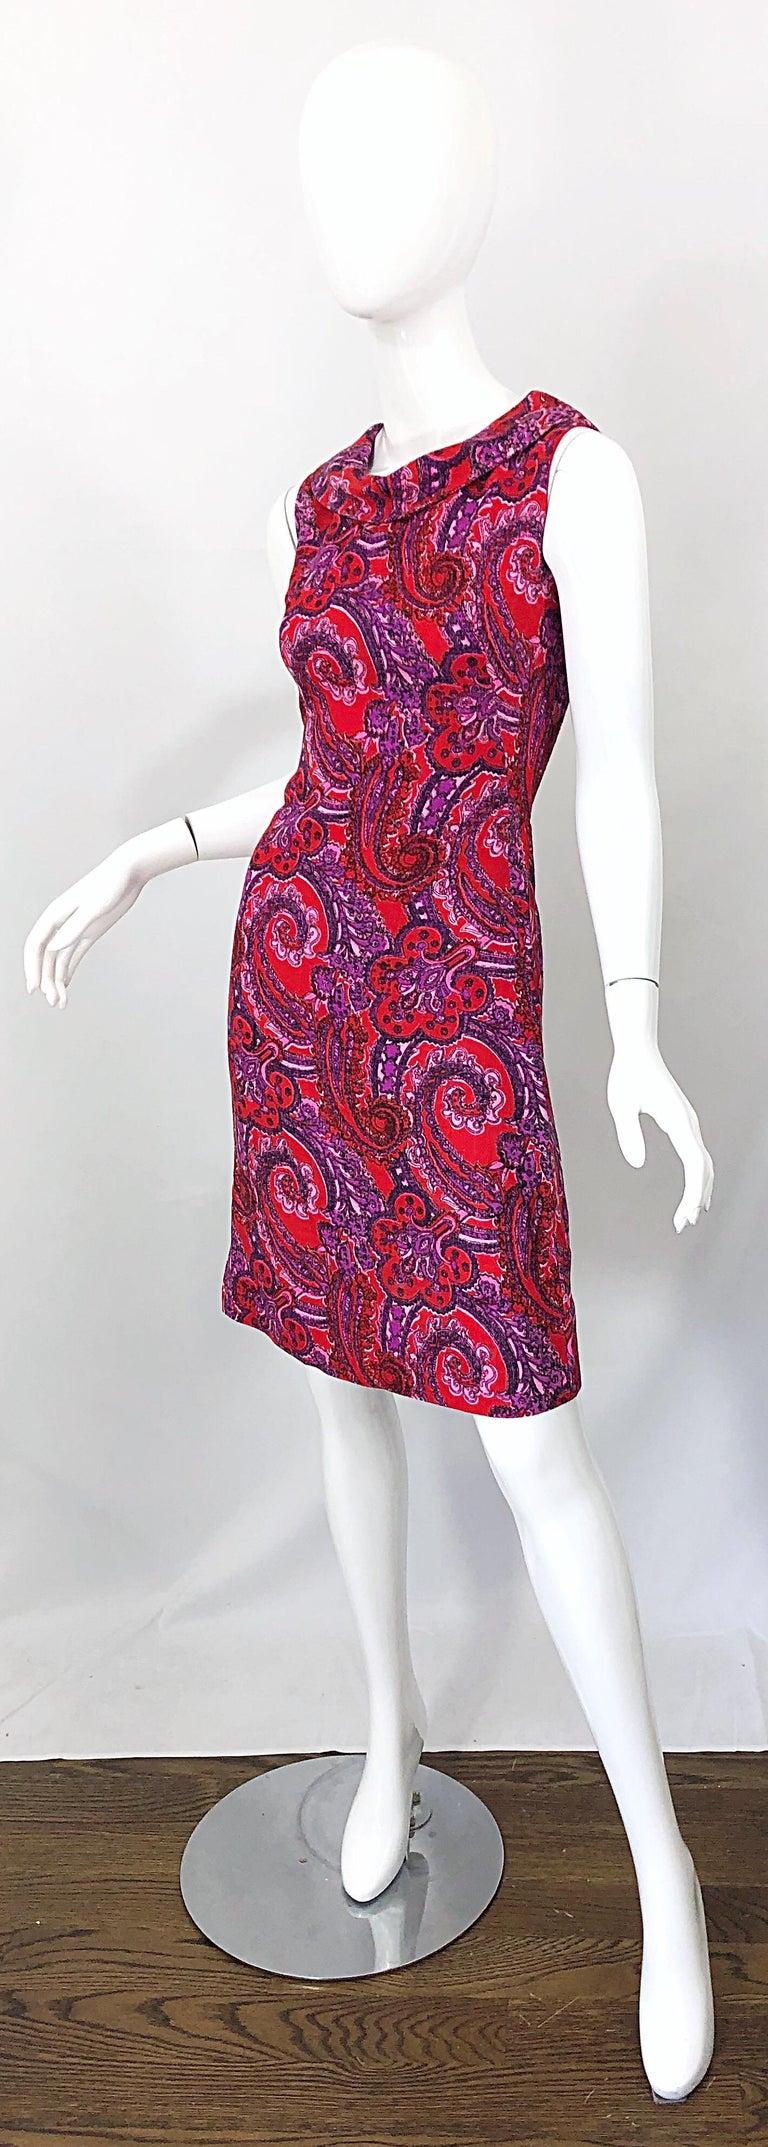 Chic 1960s Irish Linen Pink + Red + Purple Paisley Vintage 60s Mod Shift Dress For Sale 6